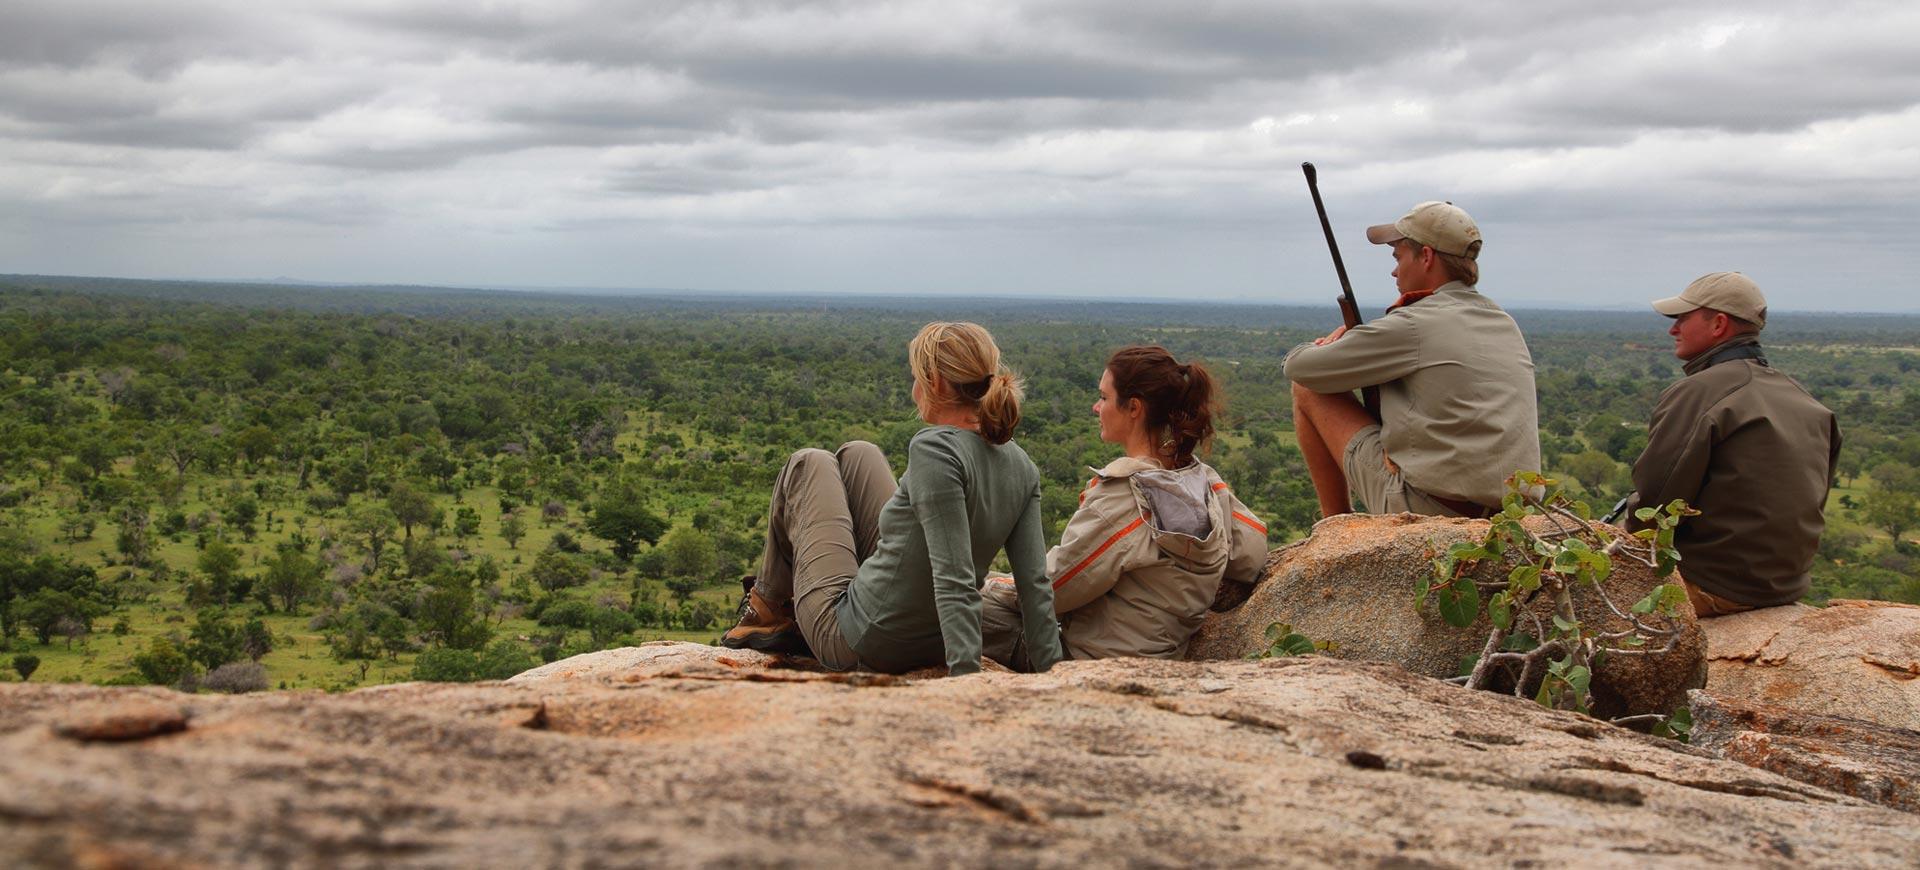 Kruger National Park Guided Walking Safari